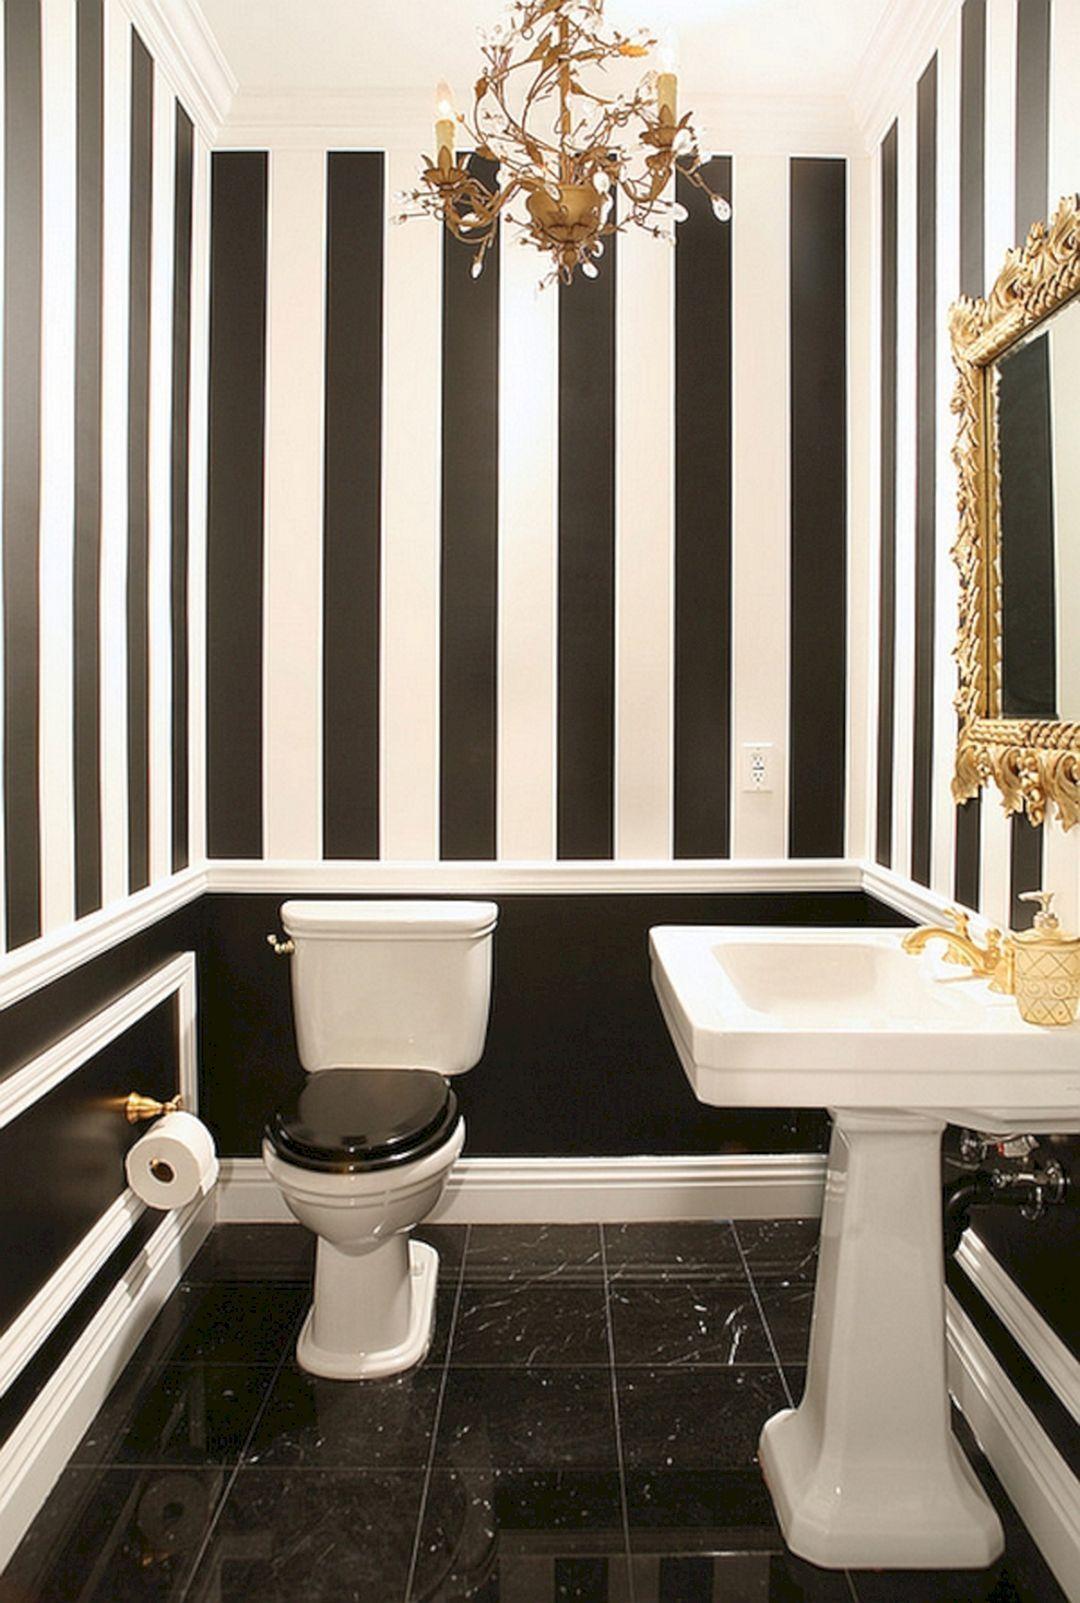 Black And White Gold Powder Room Ideas Black And White Gold Powder Room Ideas Design Ideas And Photos Bathroom Color Schemes Bathroom Inspiration Black And White Decor